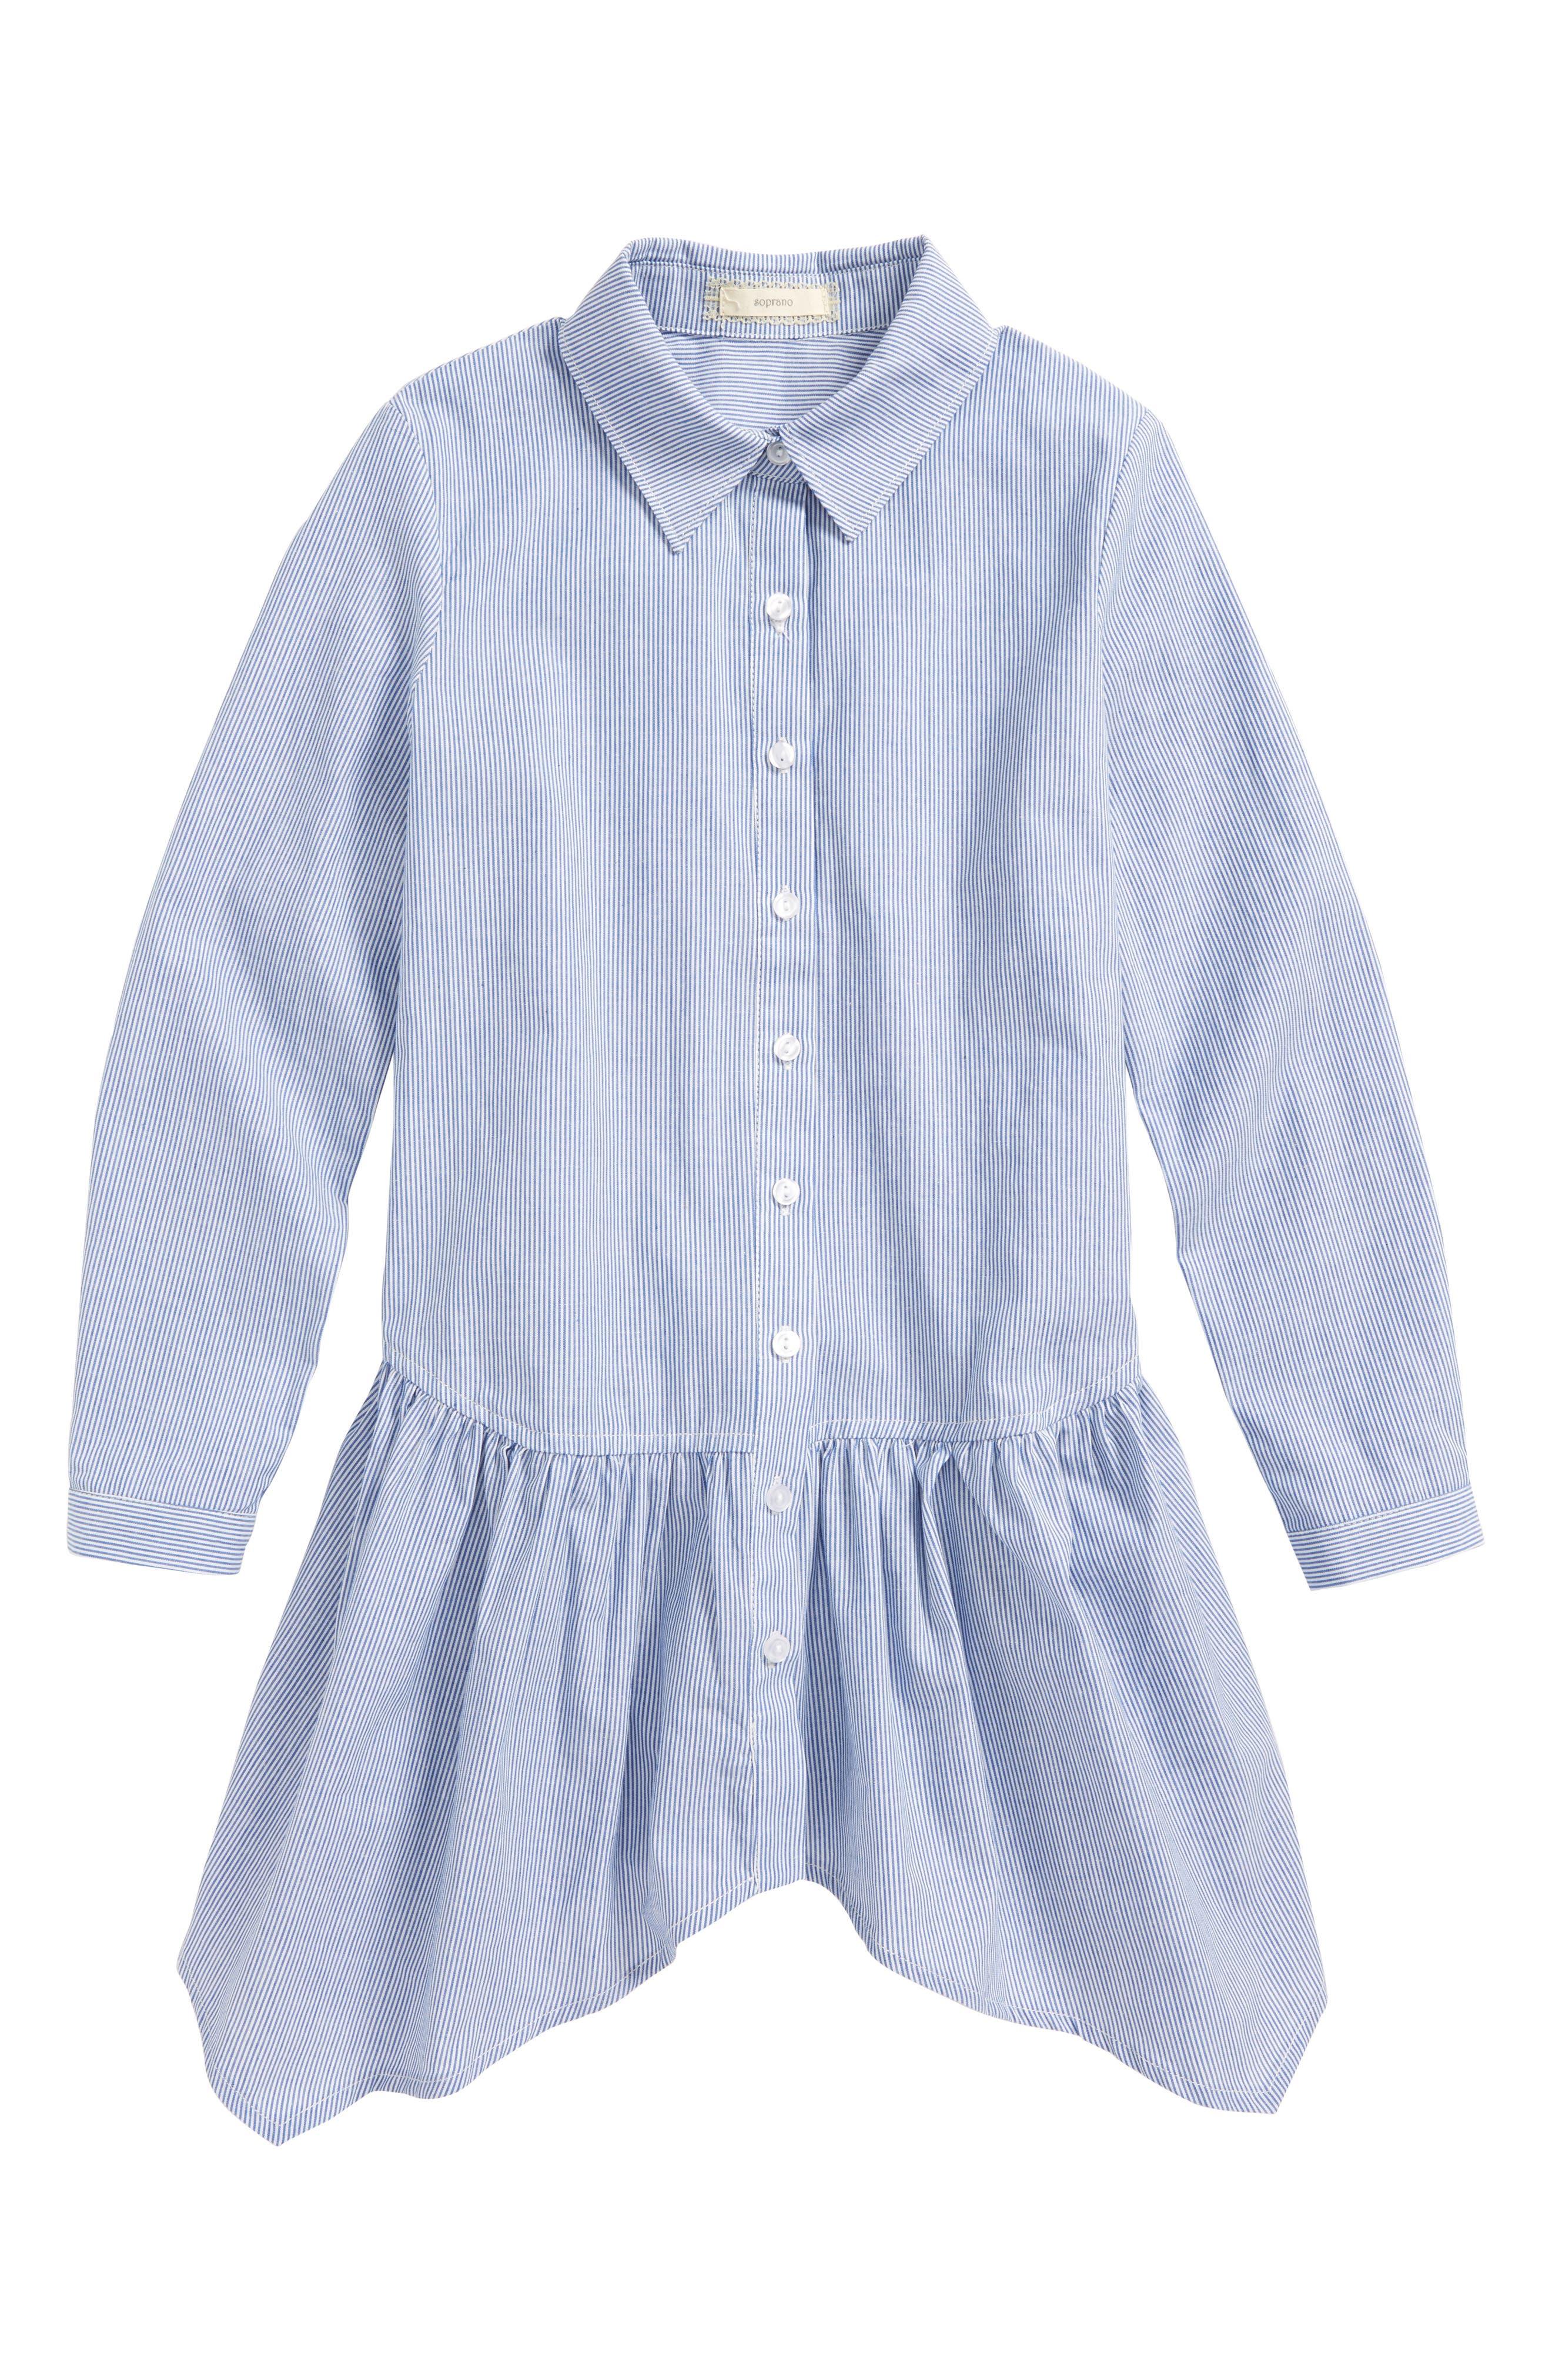 Stripe Peplum Shirt,                         Main,                         color, 401